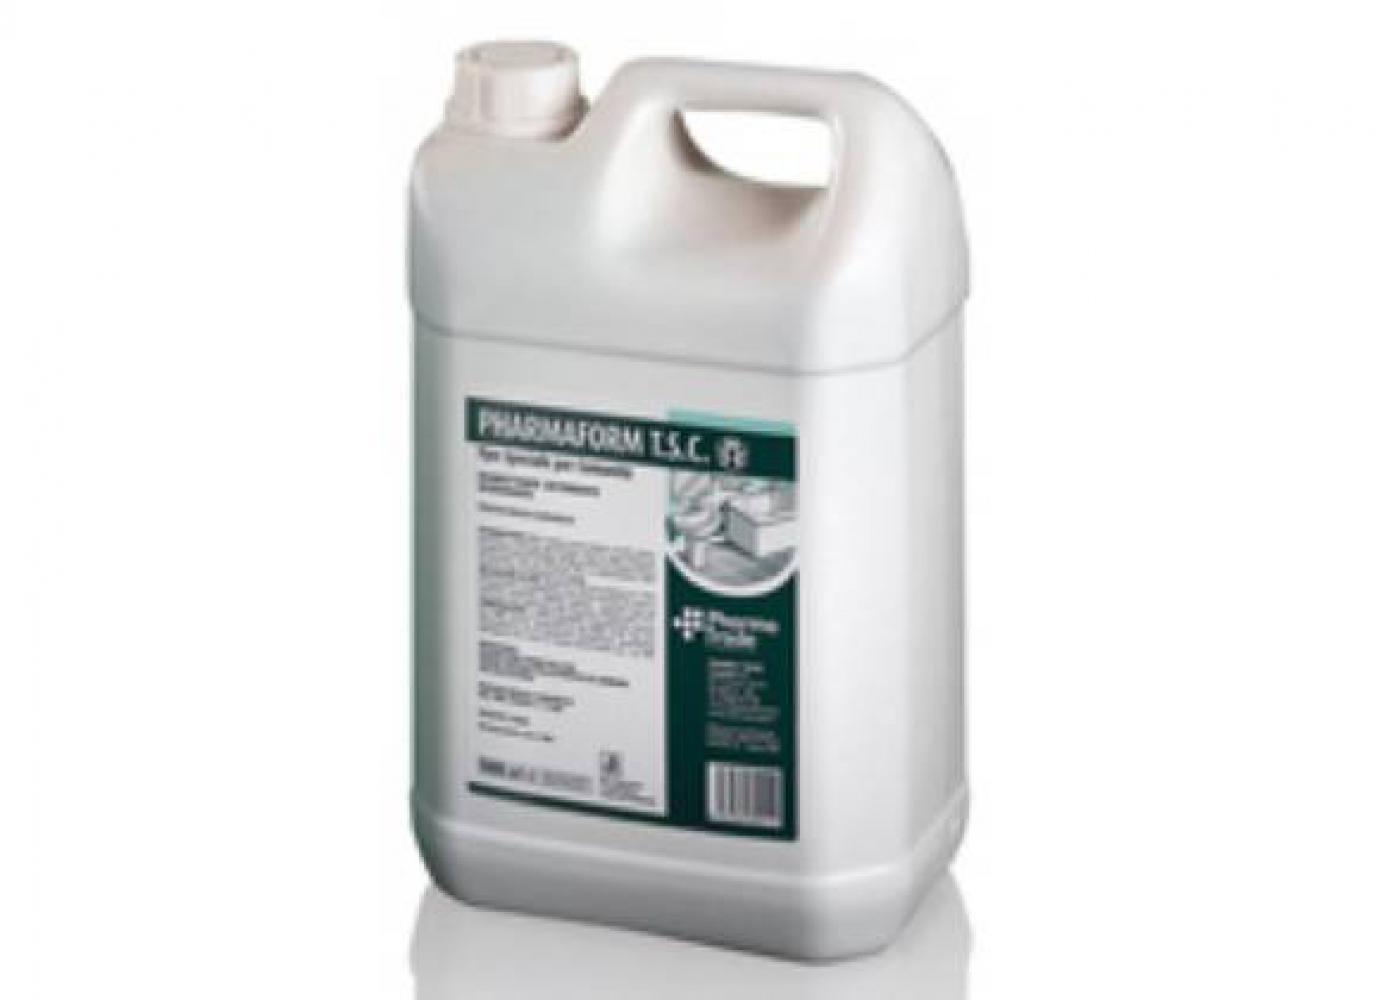 Acquista Pharmafoarm T S C Detergente 17545711 | Glooke.com